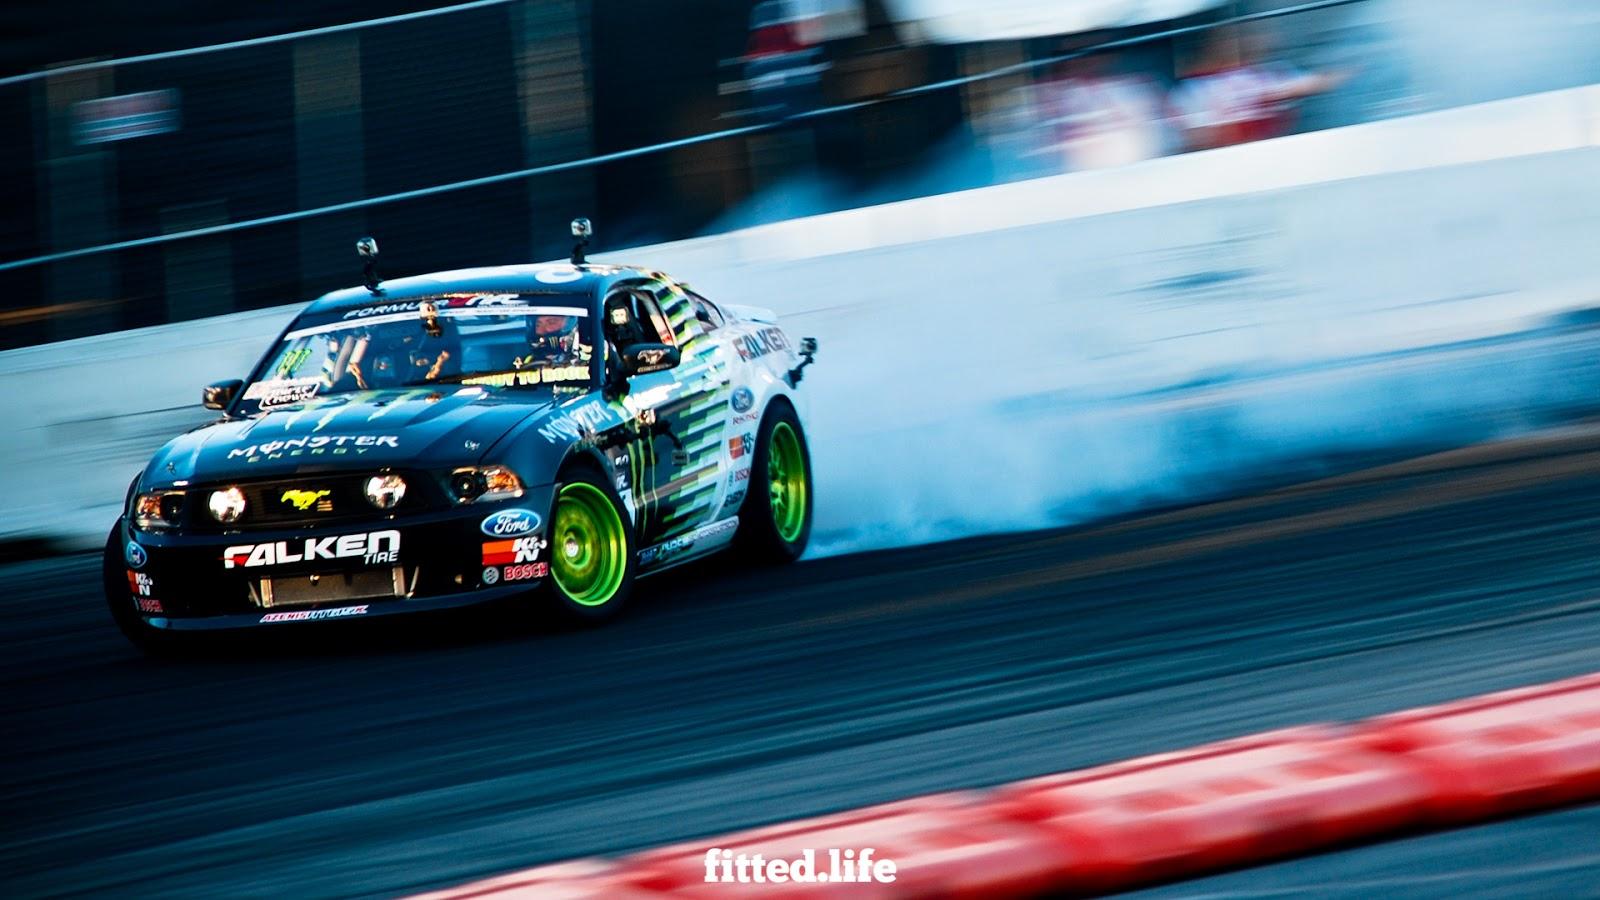 Imagenes De Autos Para Fondo De Pantalla Hd: Wallpapers HD: 24 Wallpapers De Ford Mustang